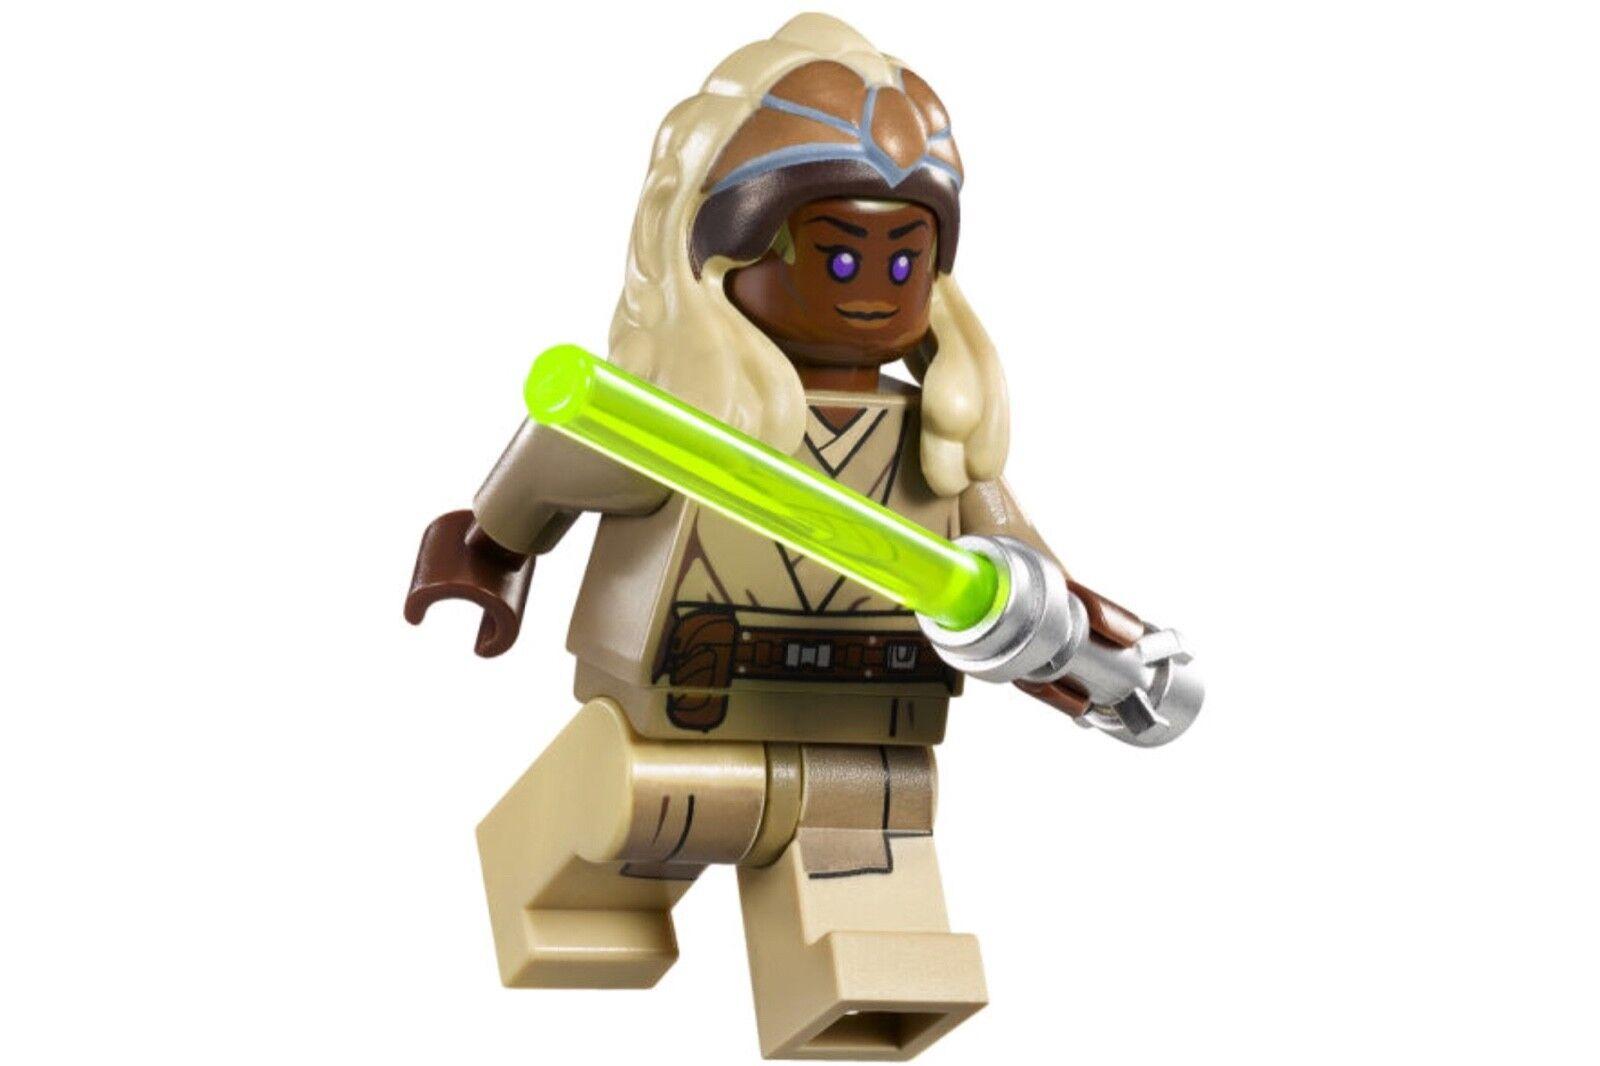 Lego Star Wars Minifigure  STASS ALLIE from set 75016 Now retiROT